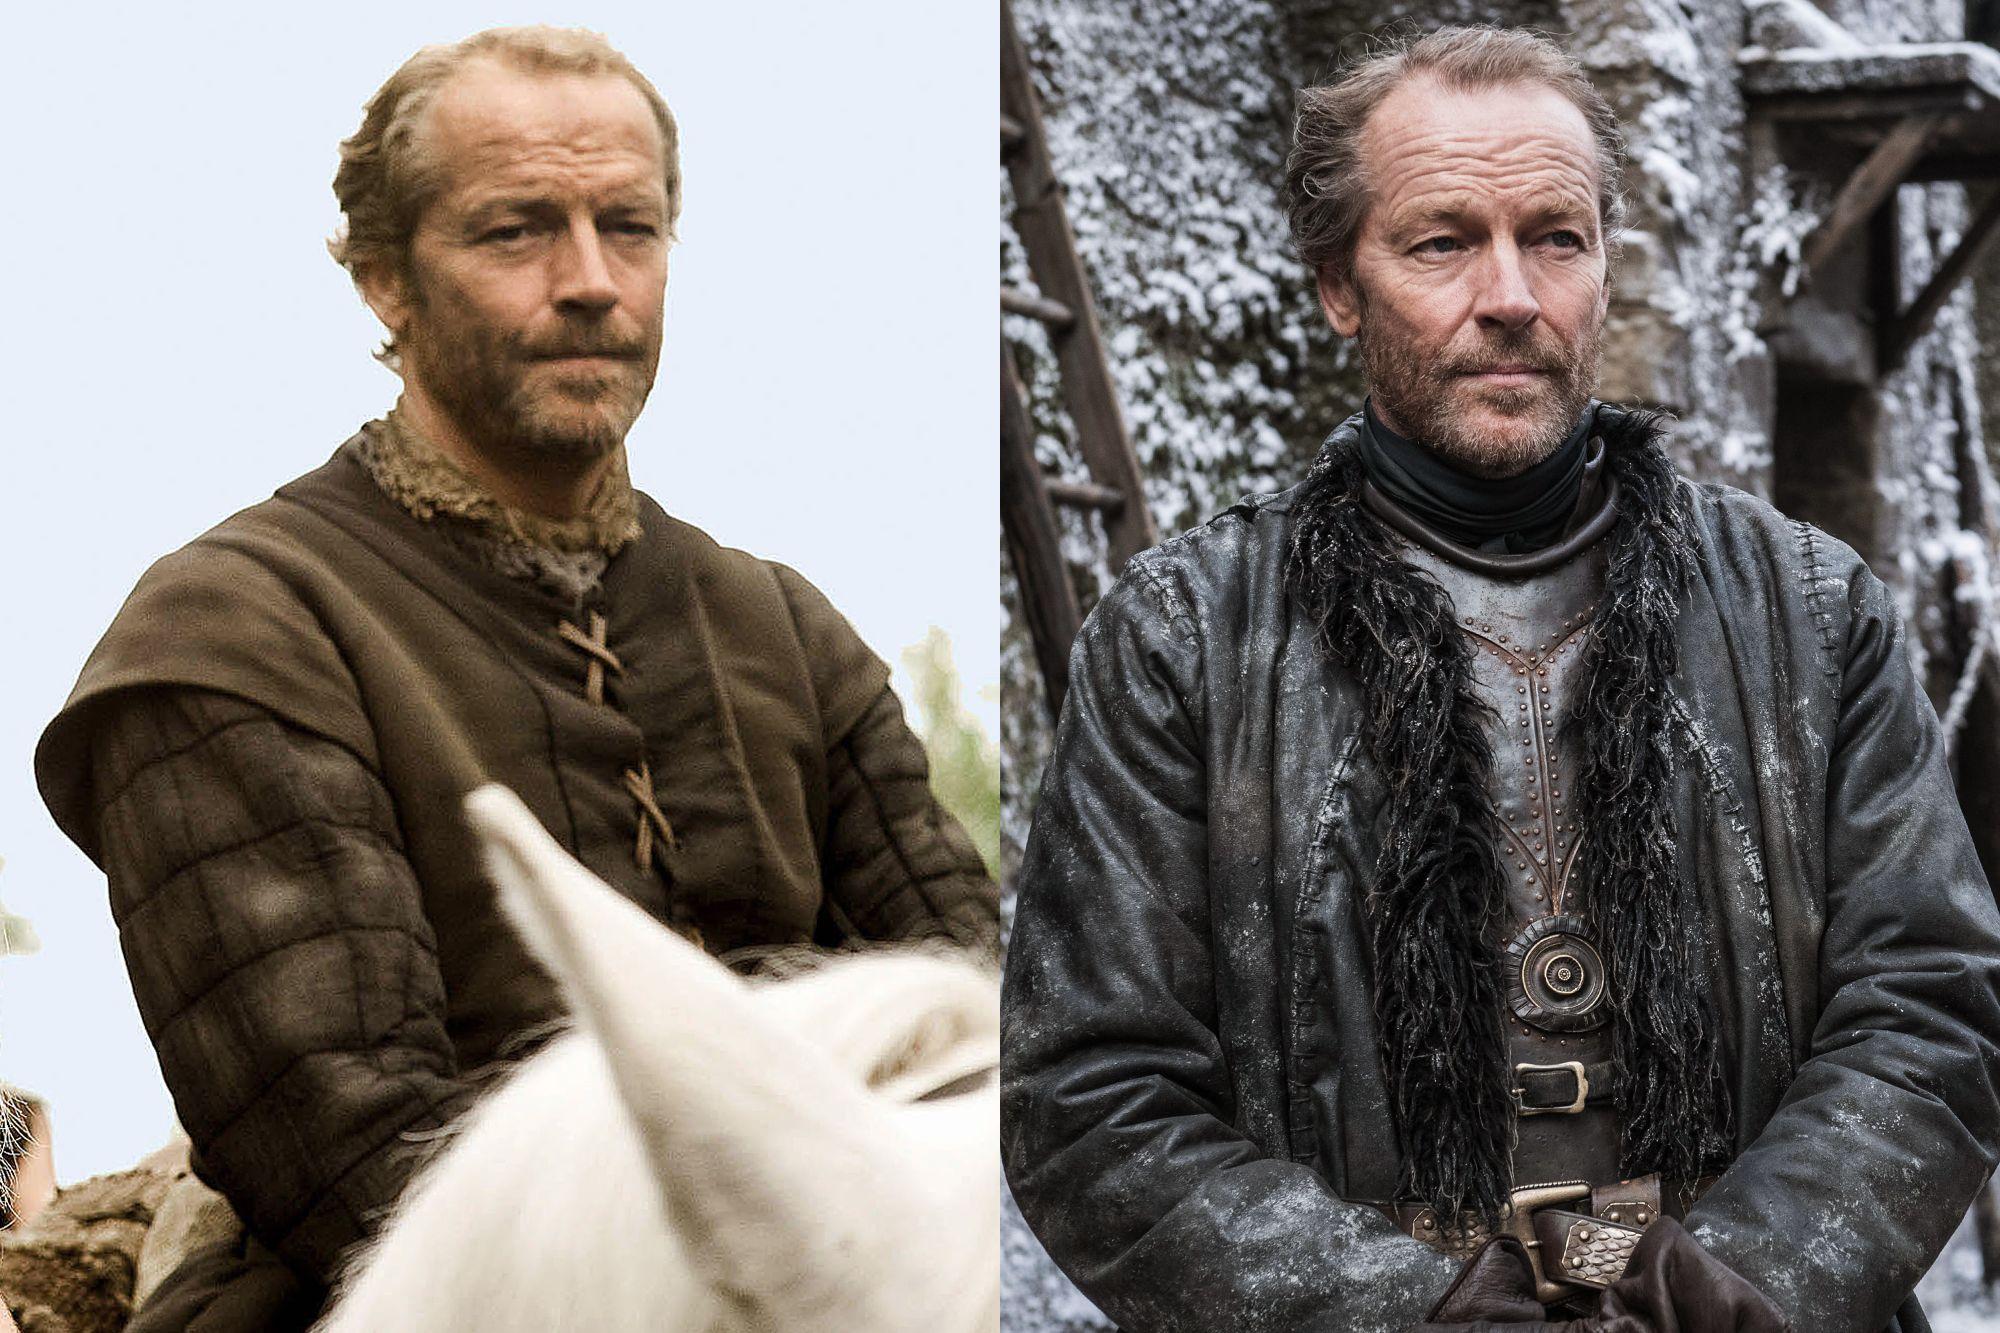 Iain Glen as Jorah Mormont Season One to Season Eight.